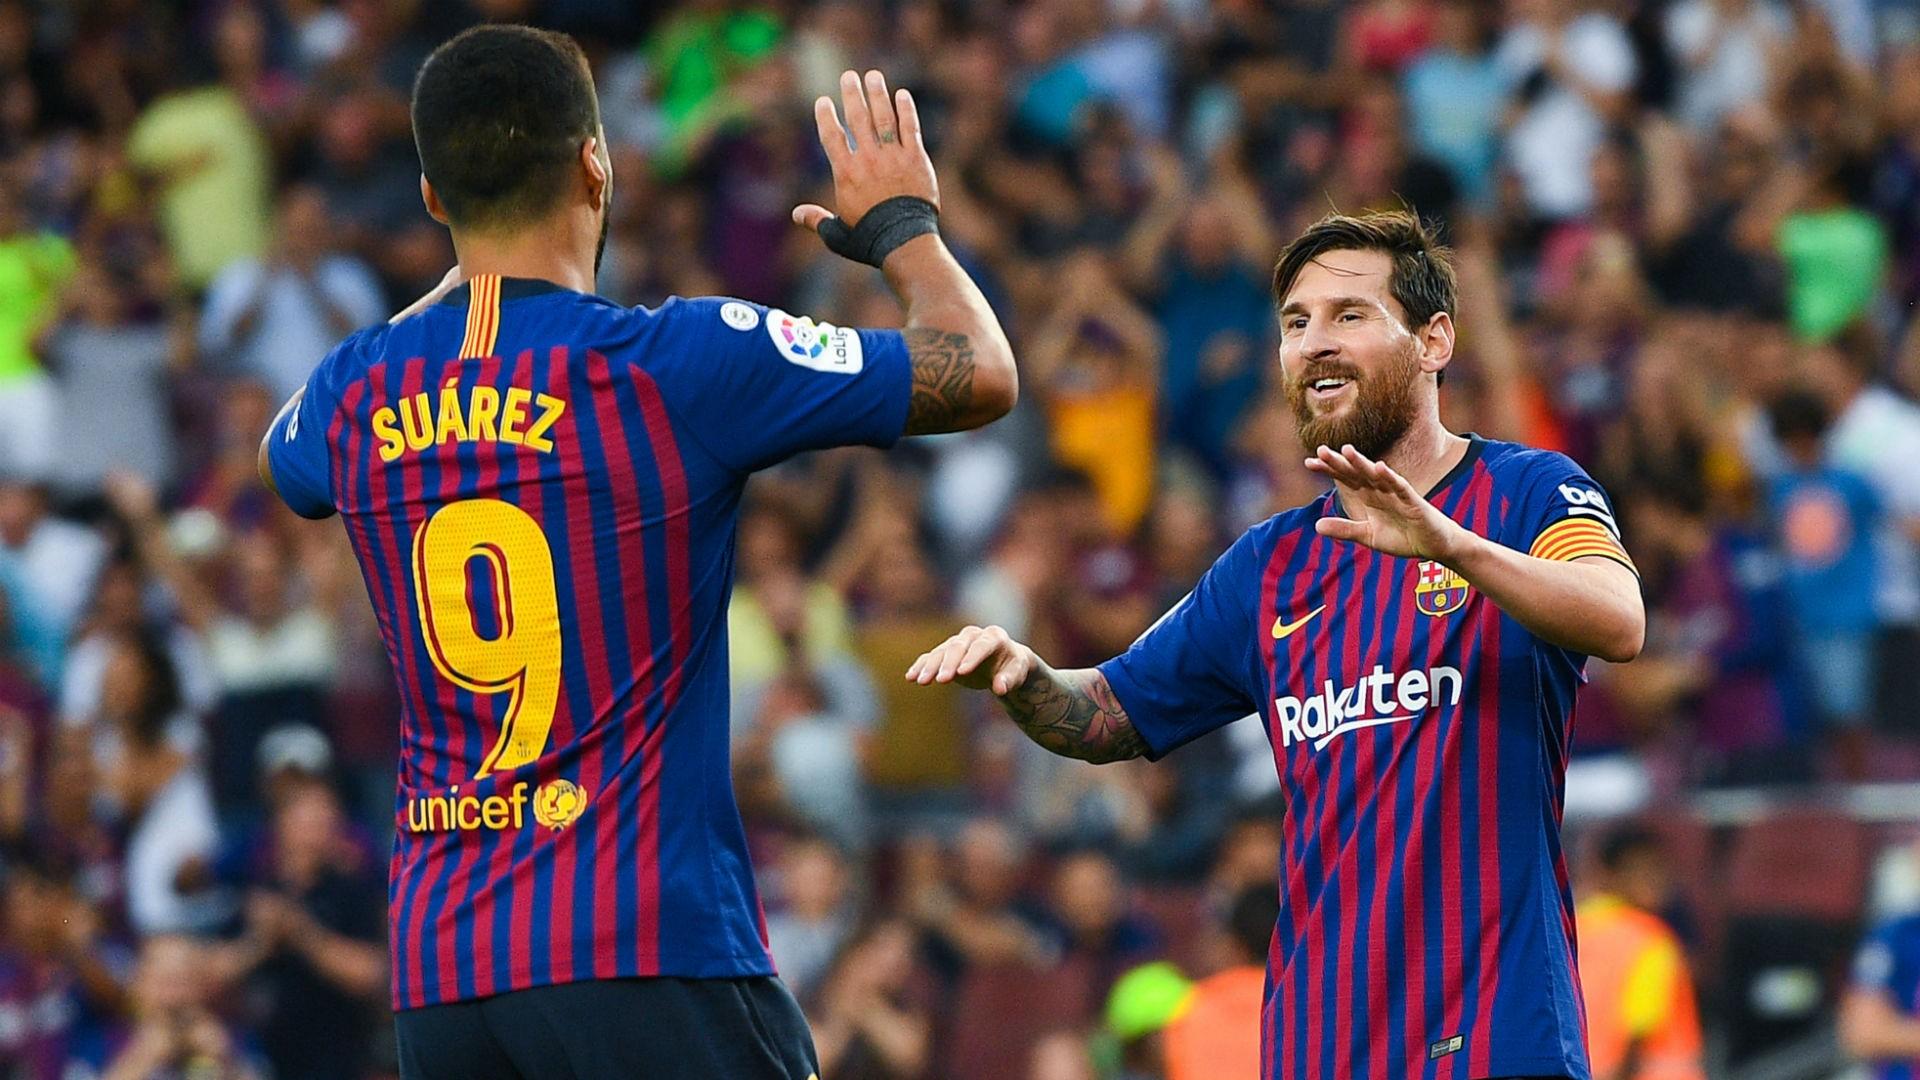 suarezmessi cropped ofvd0hv9pfx91hag3mmqjdpsu - VIDEO: Barcelona 8-2 Huesca (LaLiga) Highlights